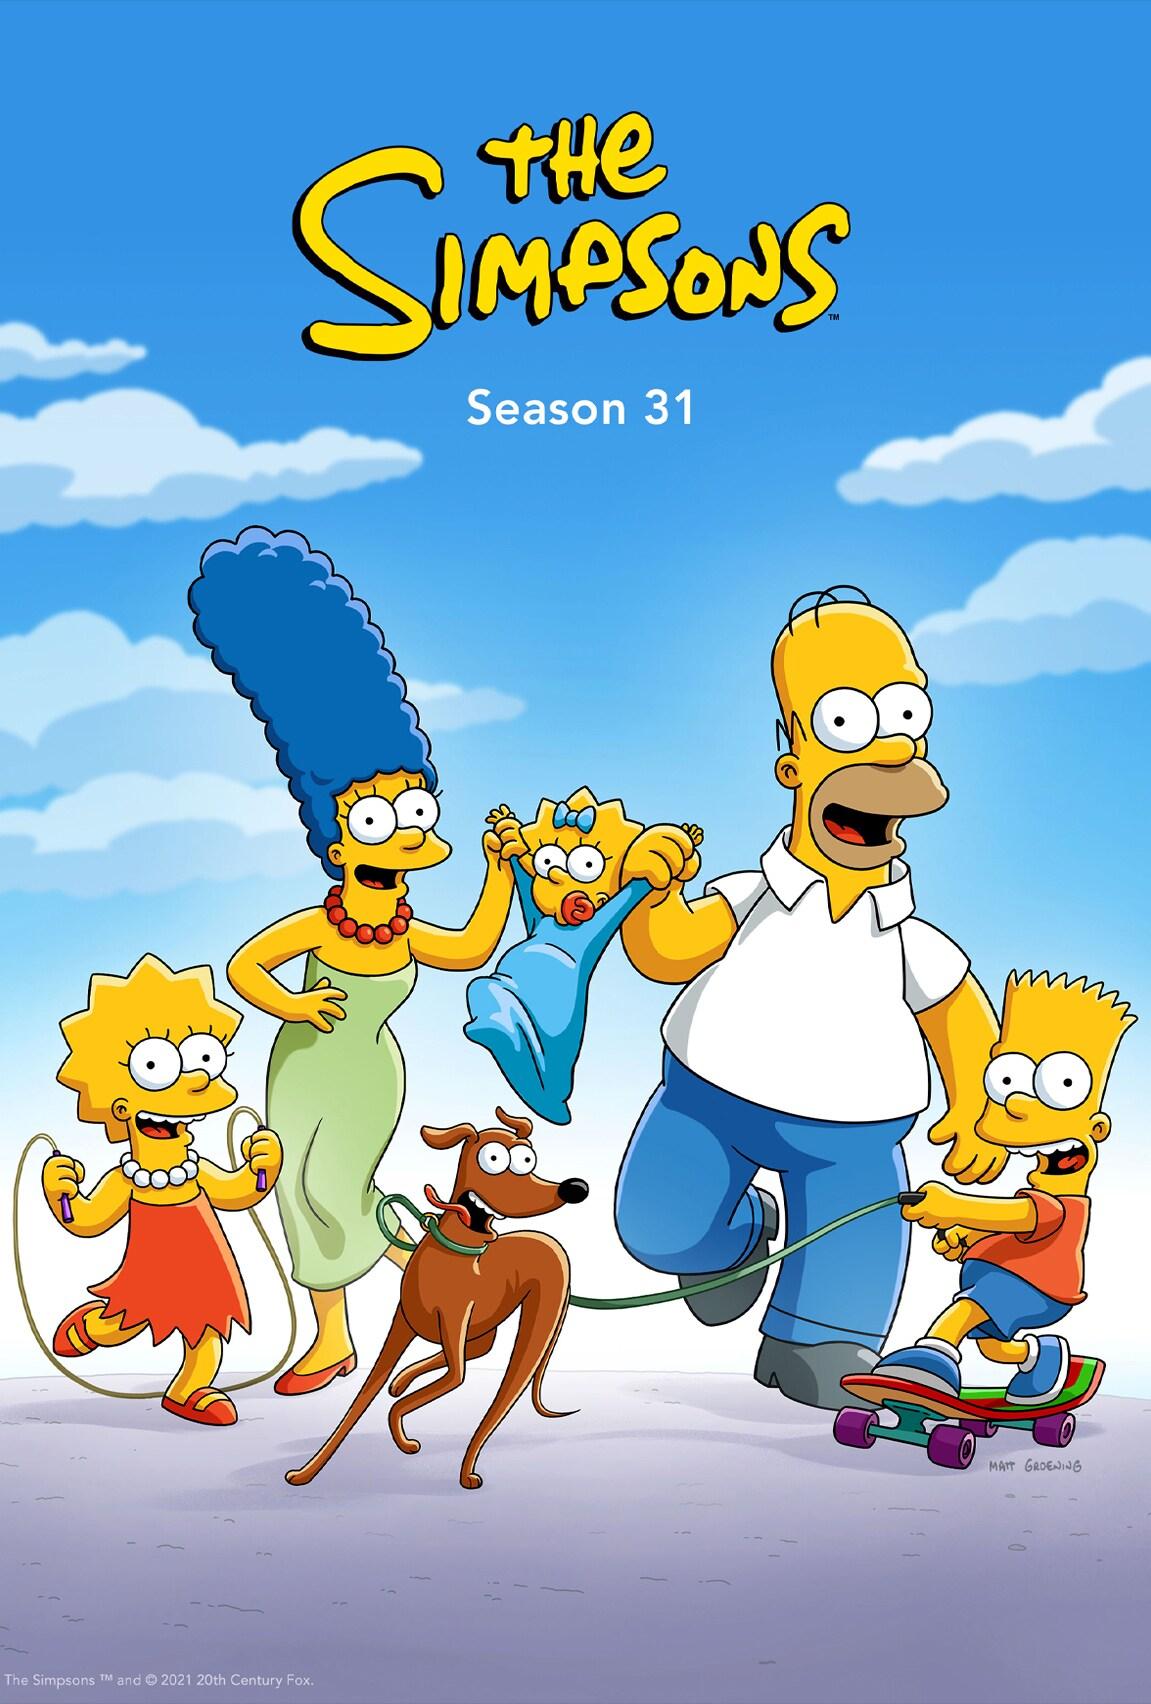 The Simpsons Season 31 on Disney Plus